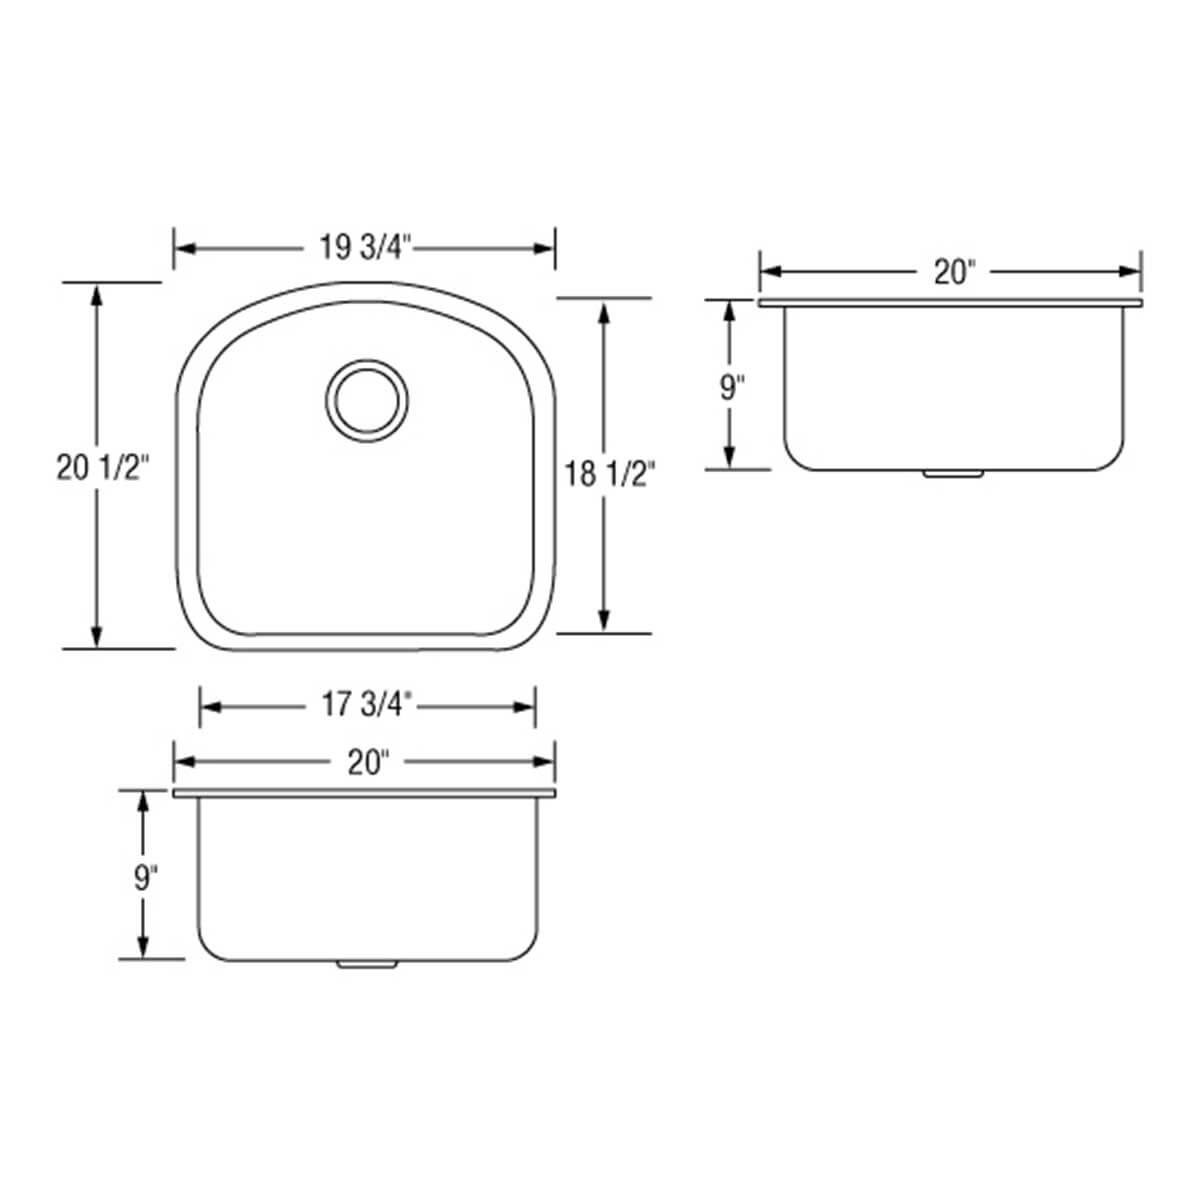 AR2120D9-D Artisan Sinks draw